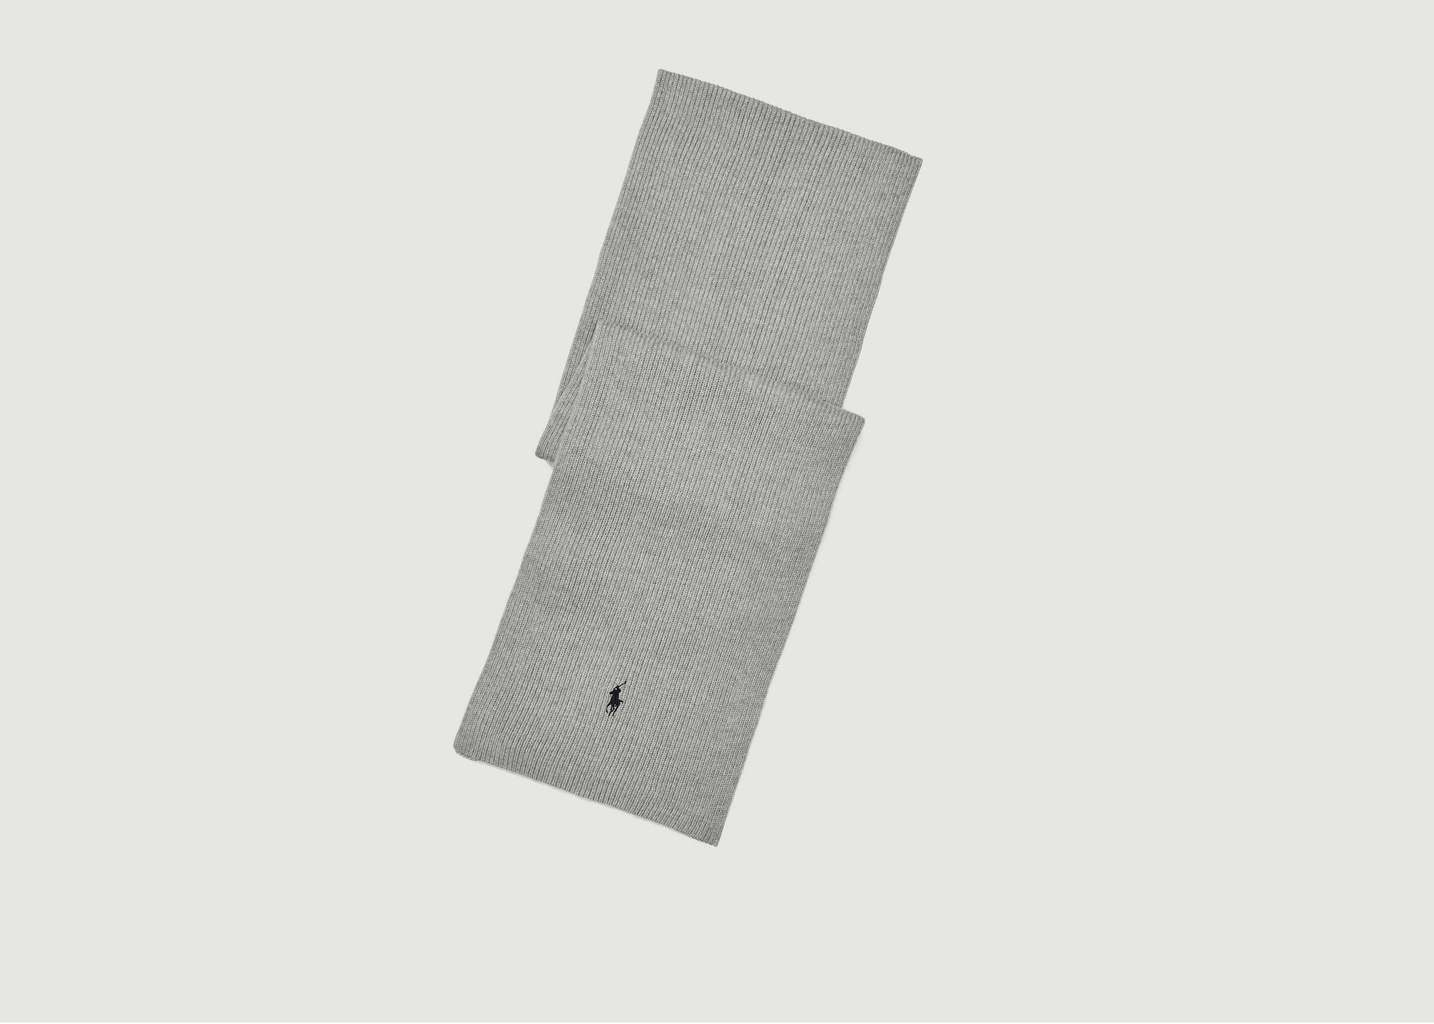 Écharpe Siglée En Laine Mérinos - Polo Ralph Lauren